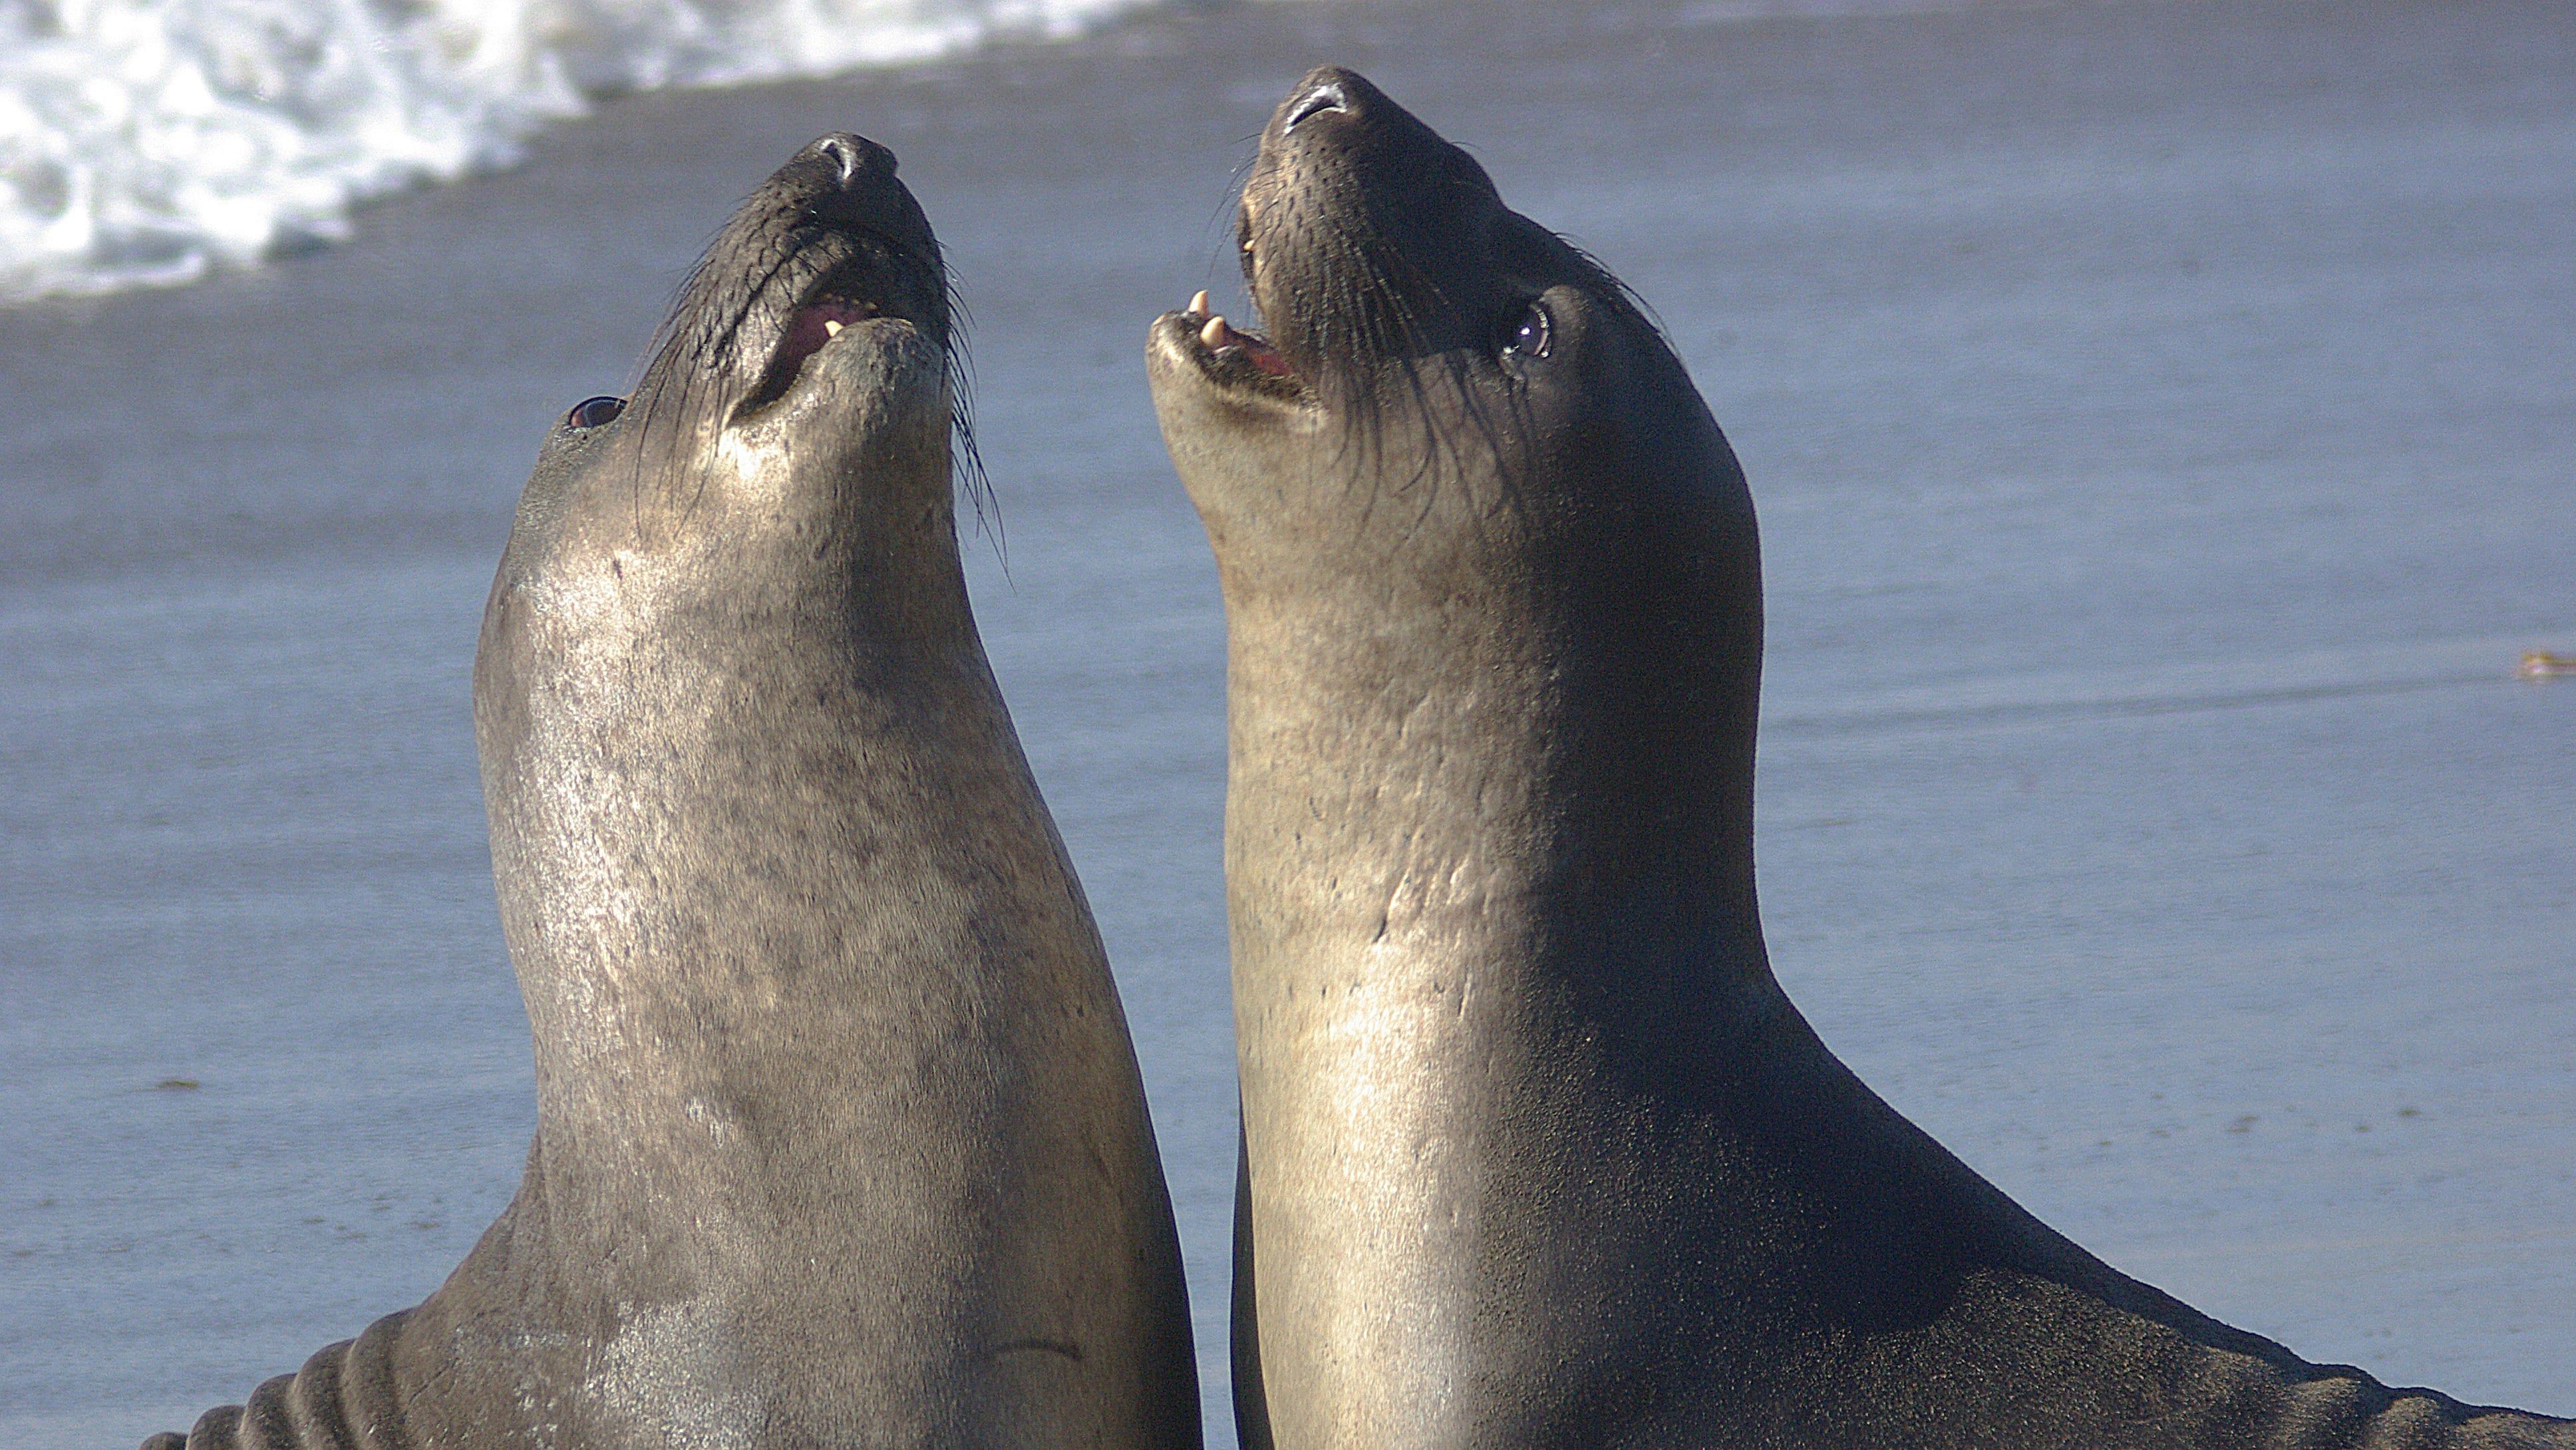 Peru Marine Conservation Project